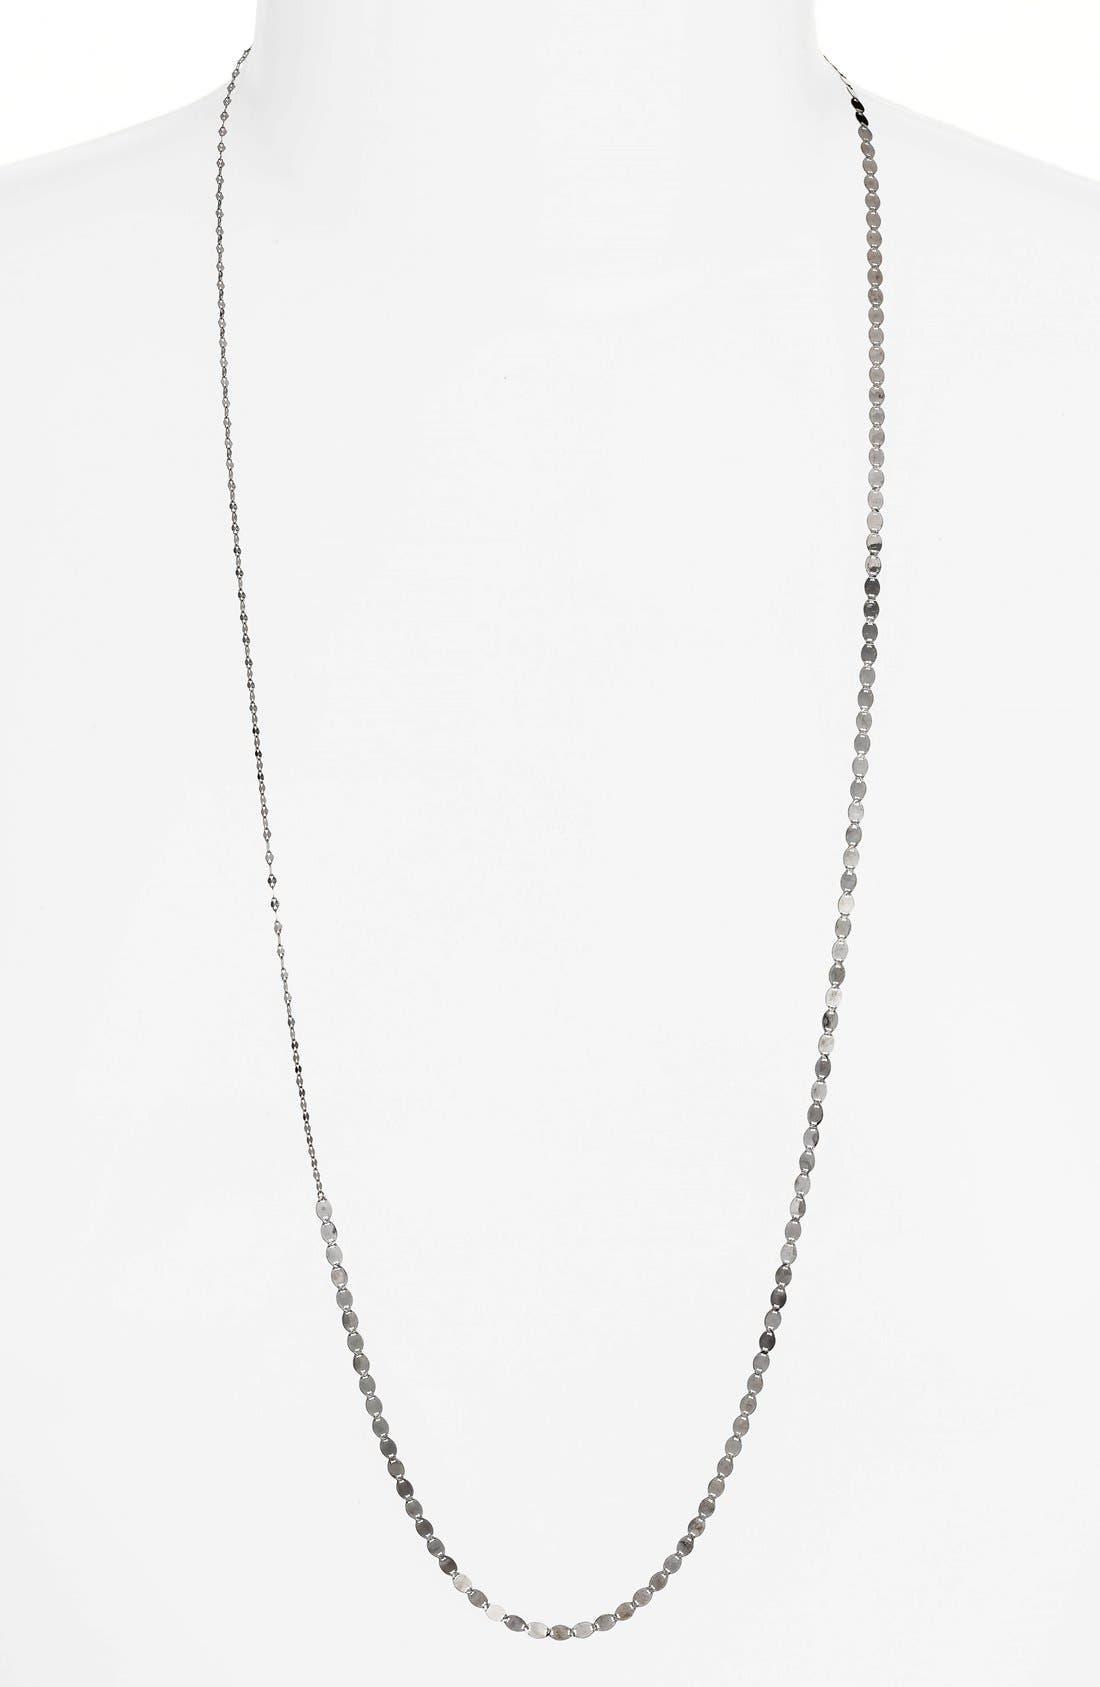 Alternate Image 1 Selected - Lana Jewelry 'Long Vanity' Strand Necklace